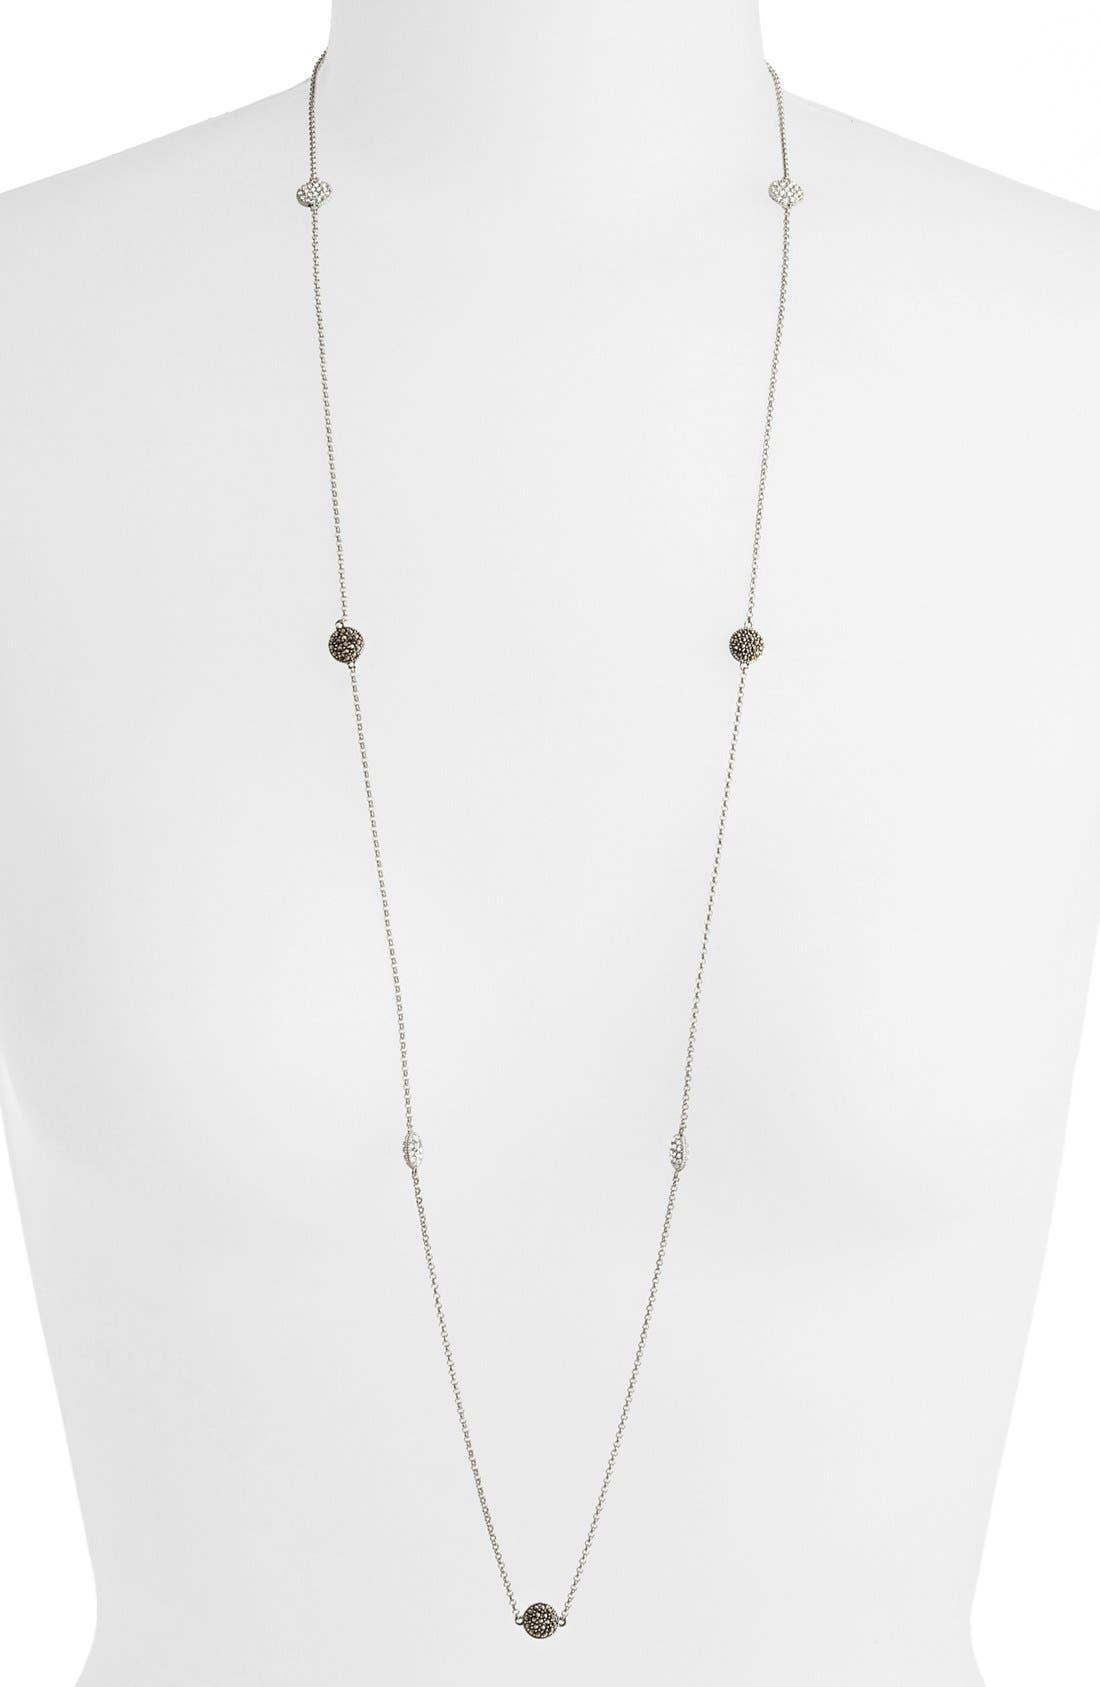 Alternate Image 1 Selected - Judith Jack Long Station Necklace